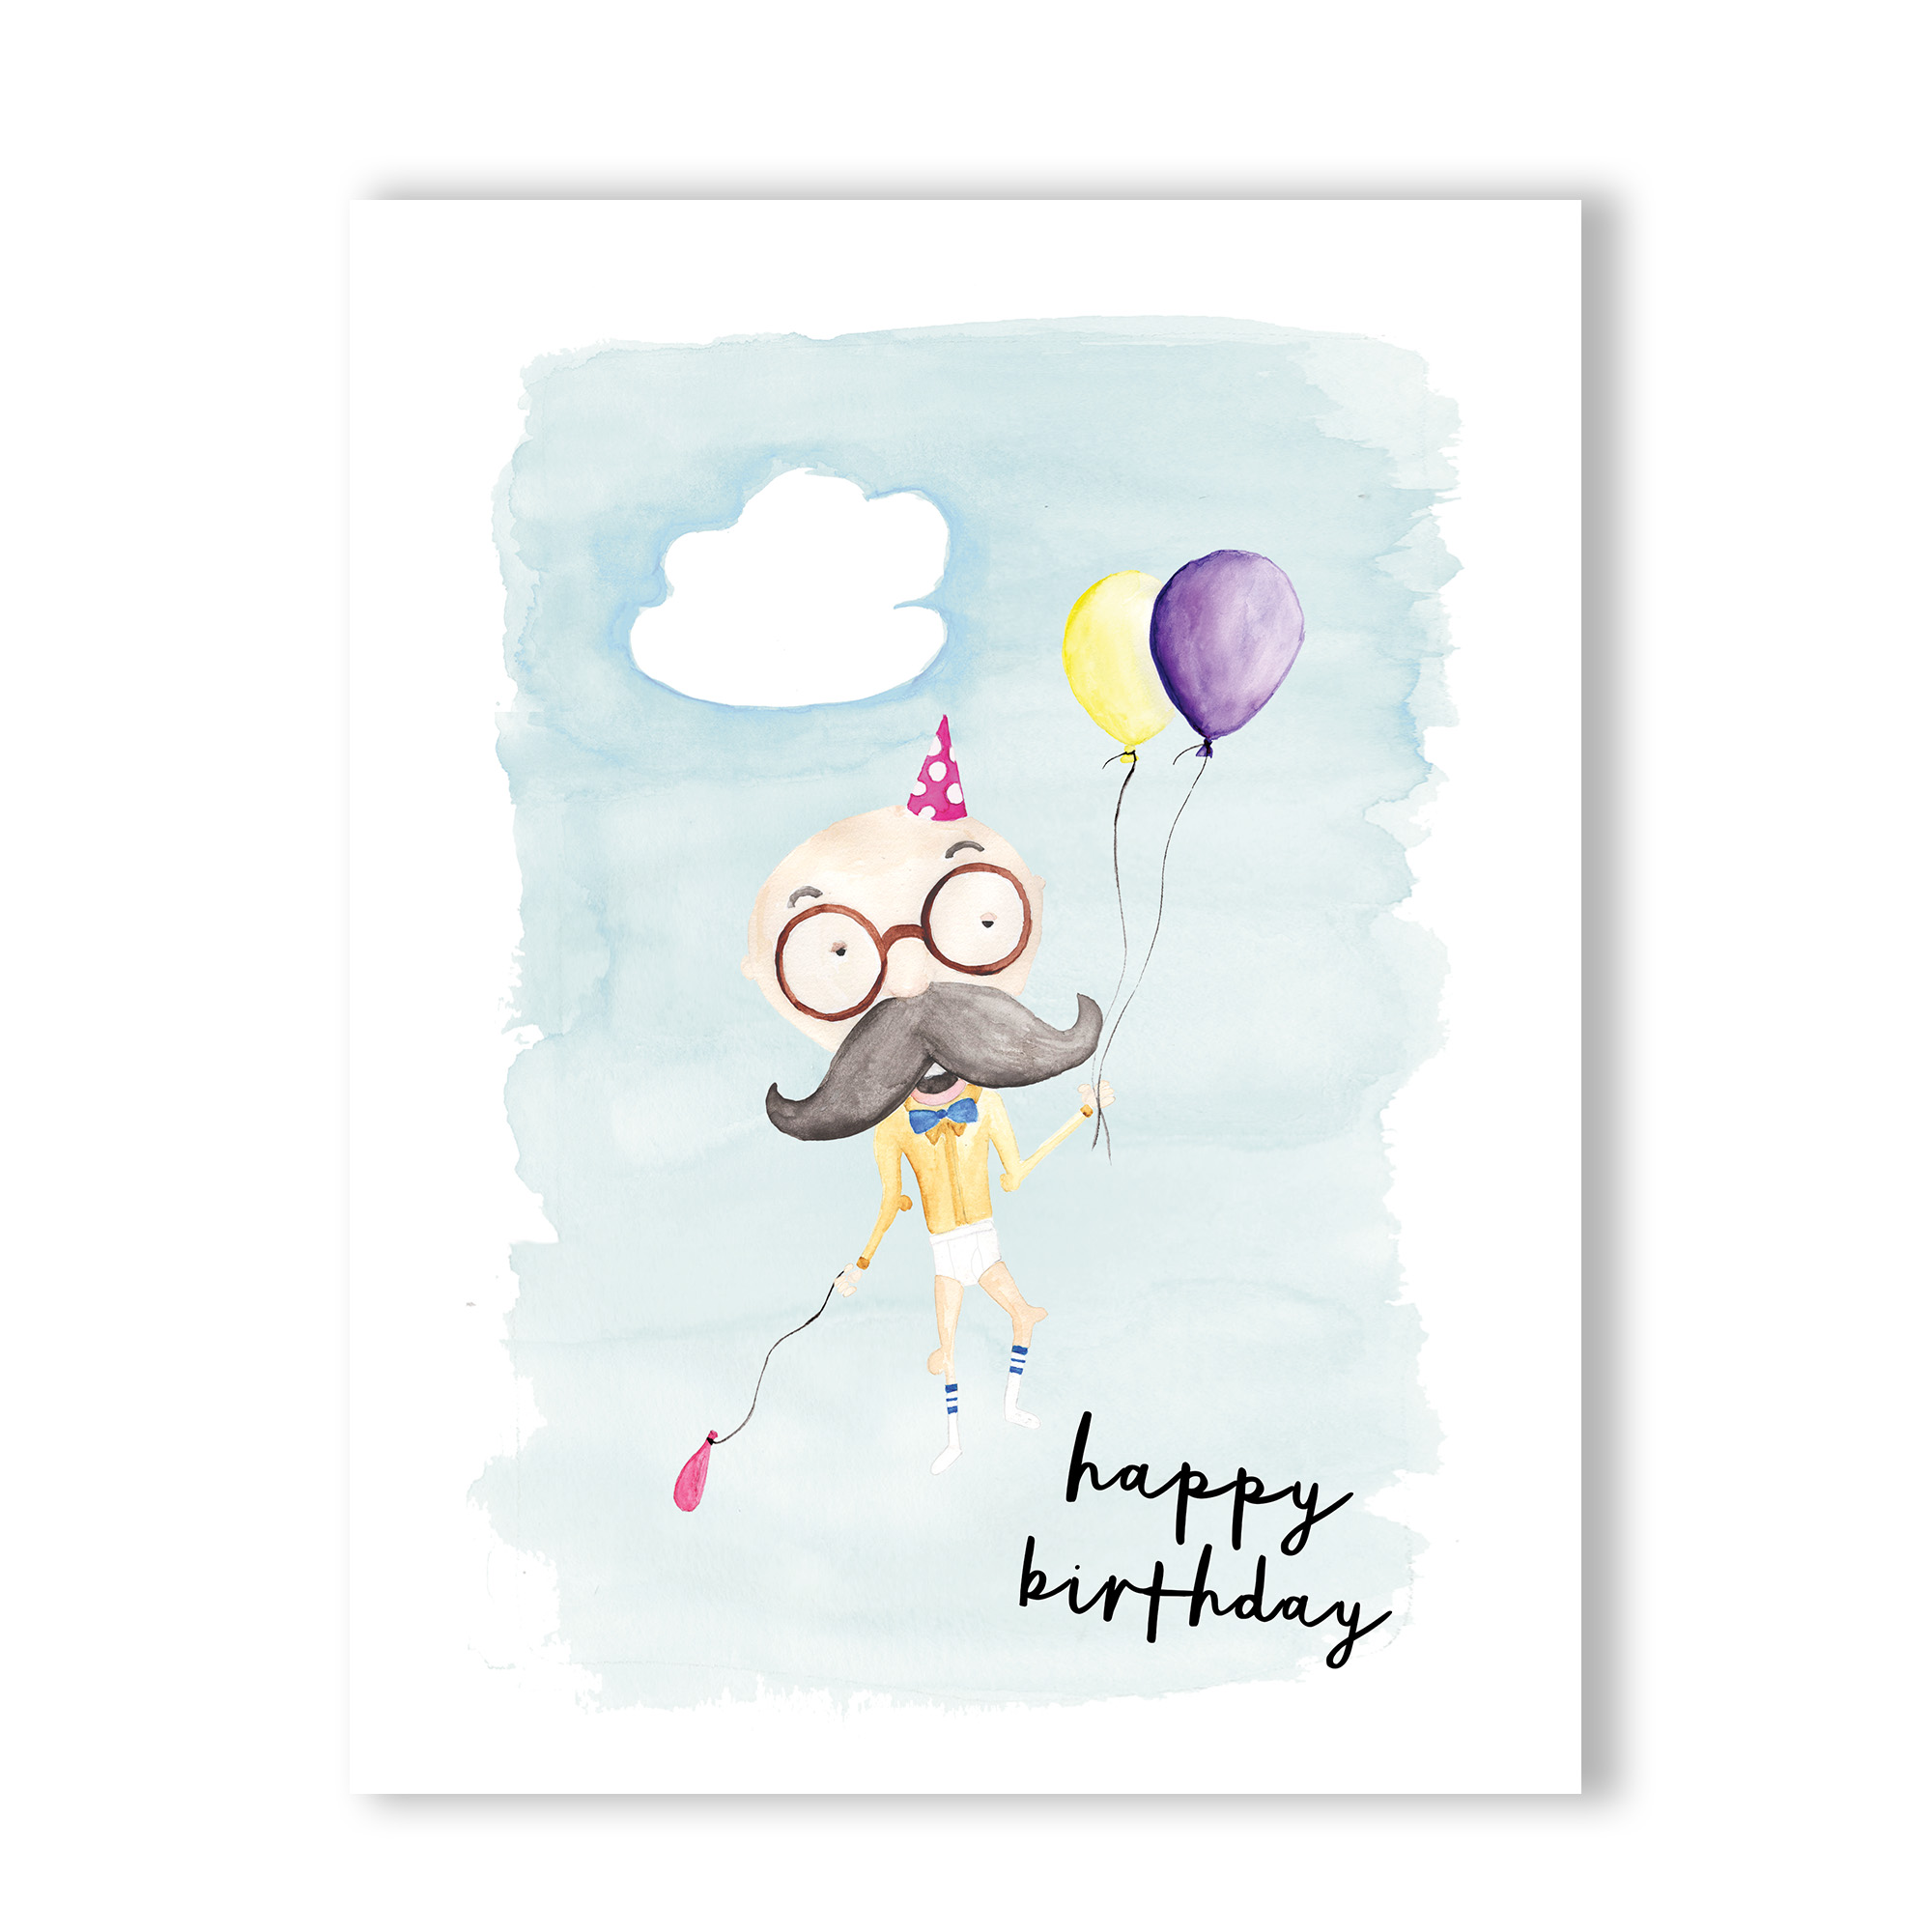 2000x2000 Happy Birthday Watercolor Hearts And Sharts